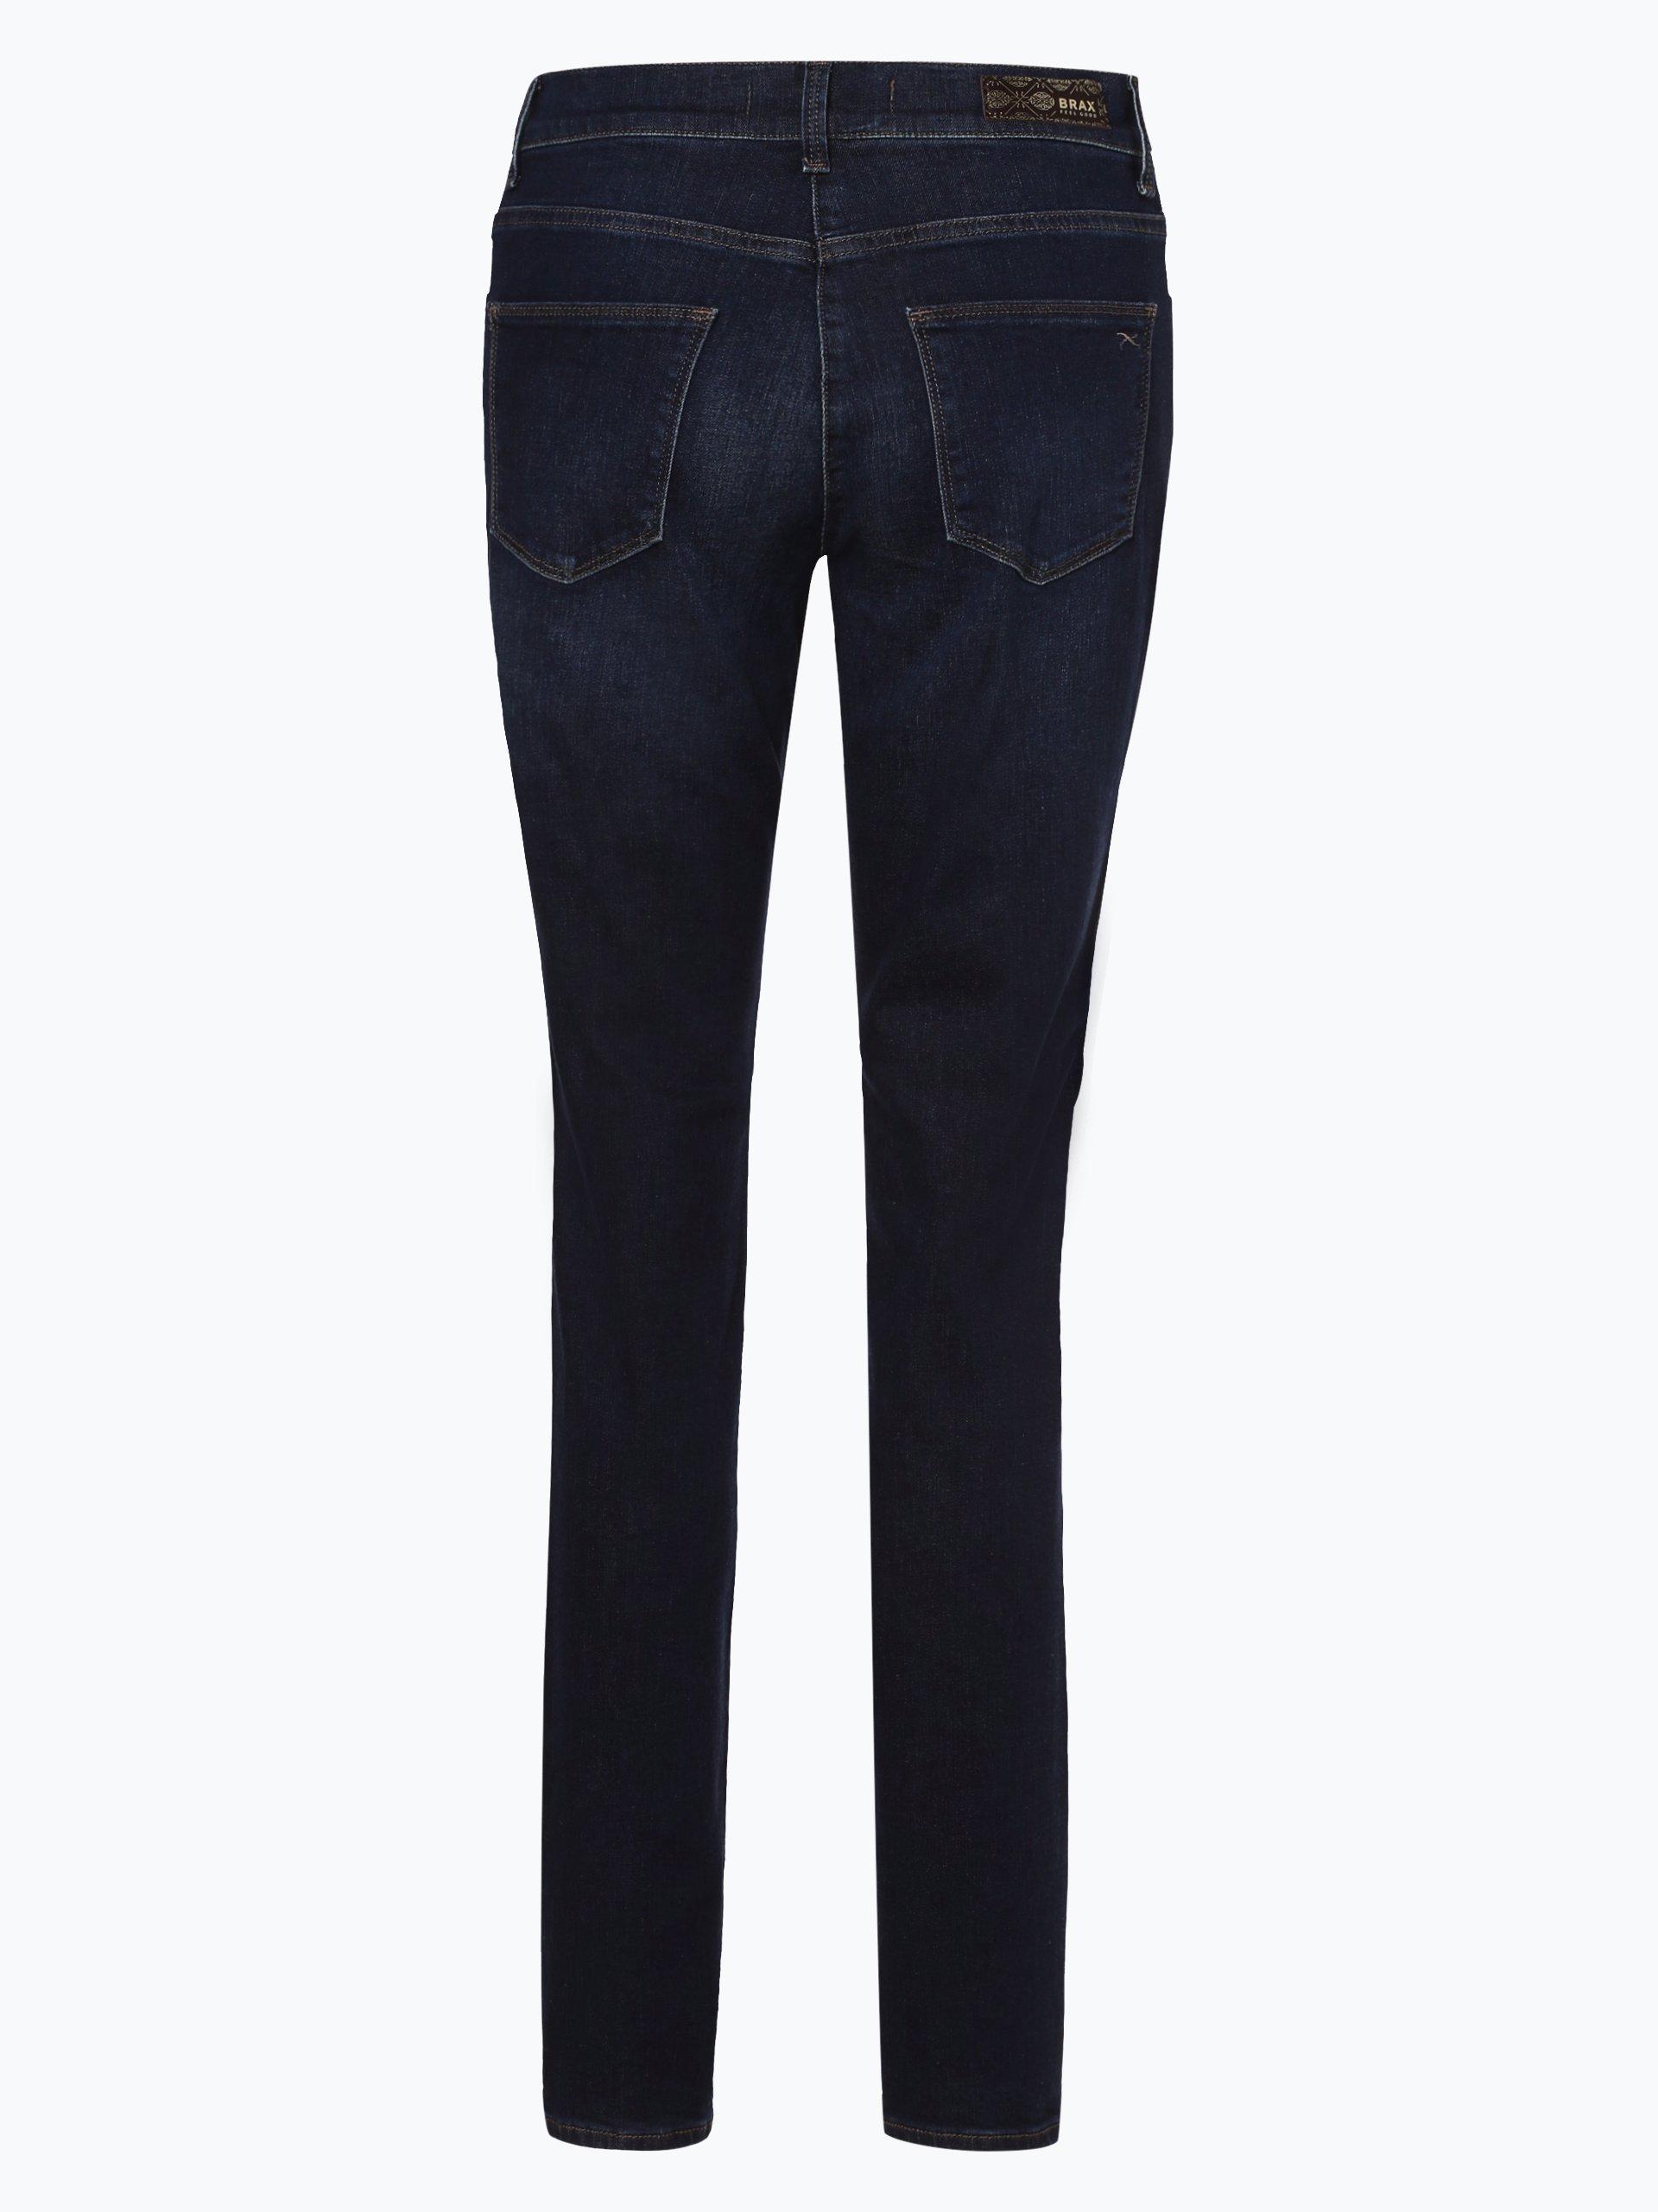 BRAX Damen Jeans - Sara